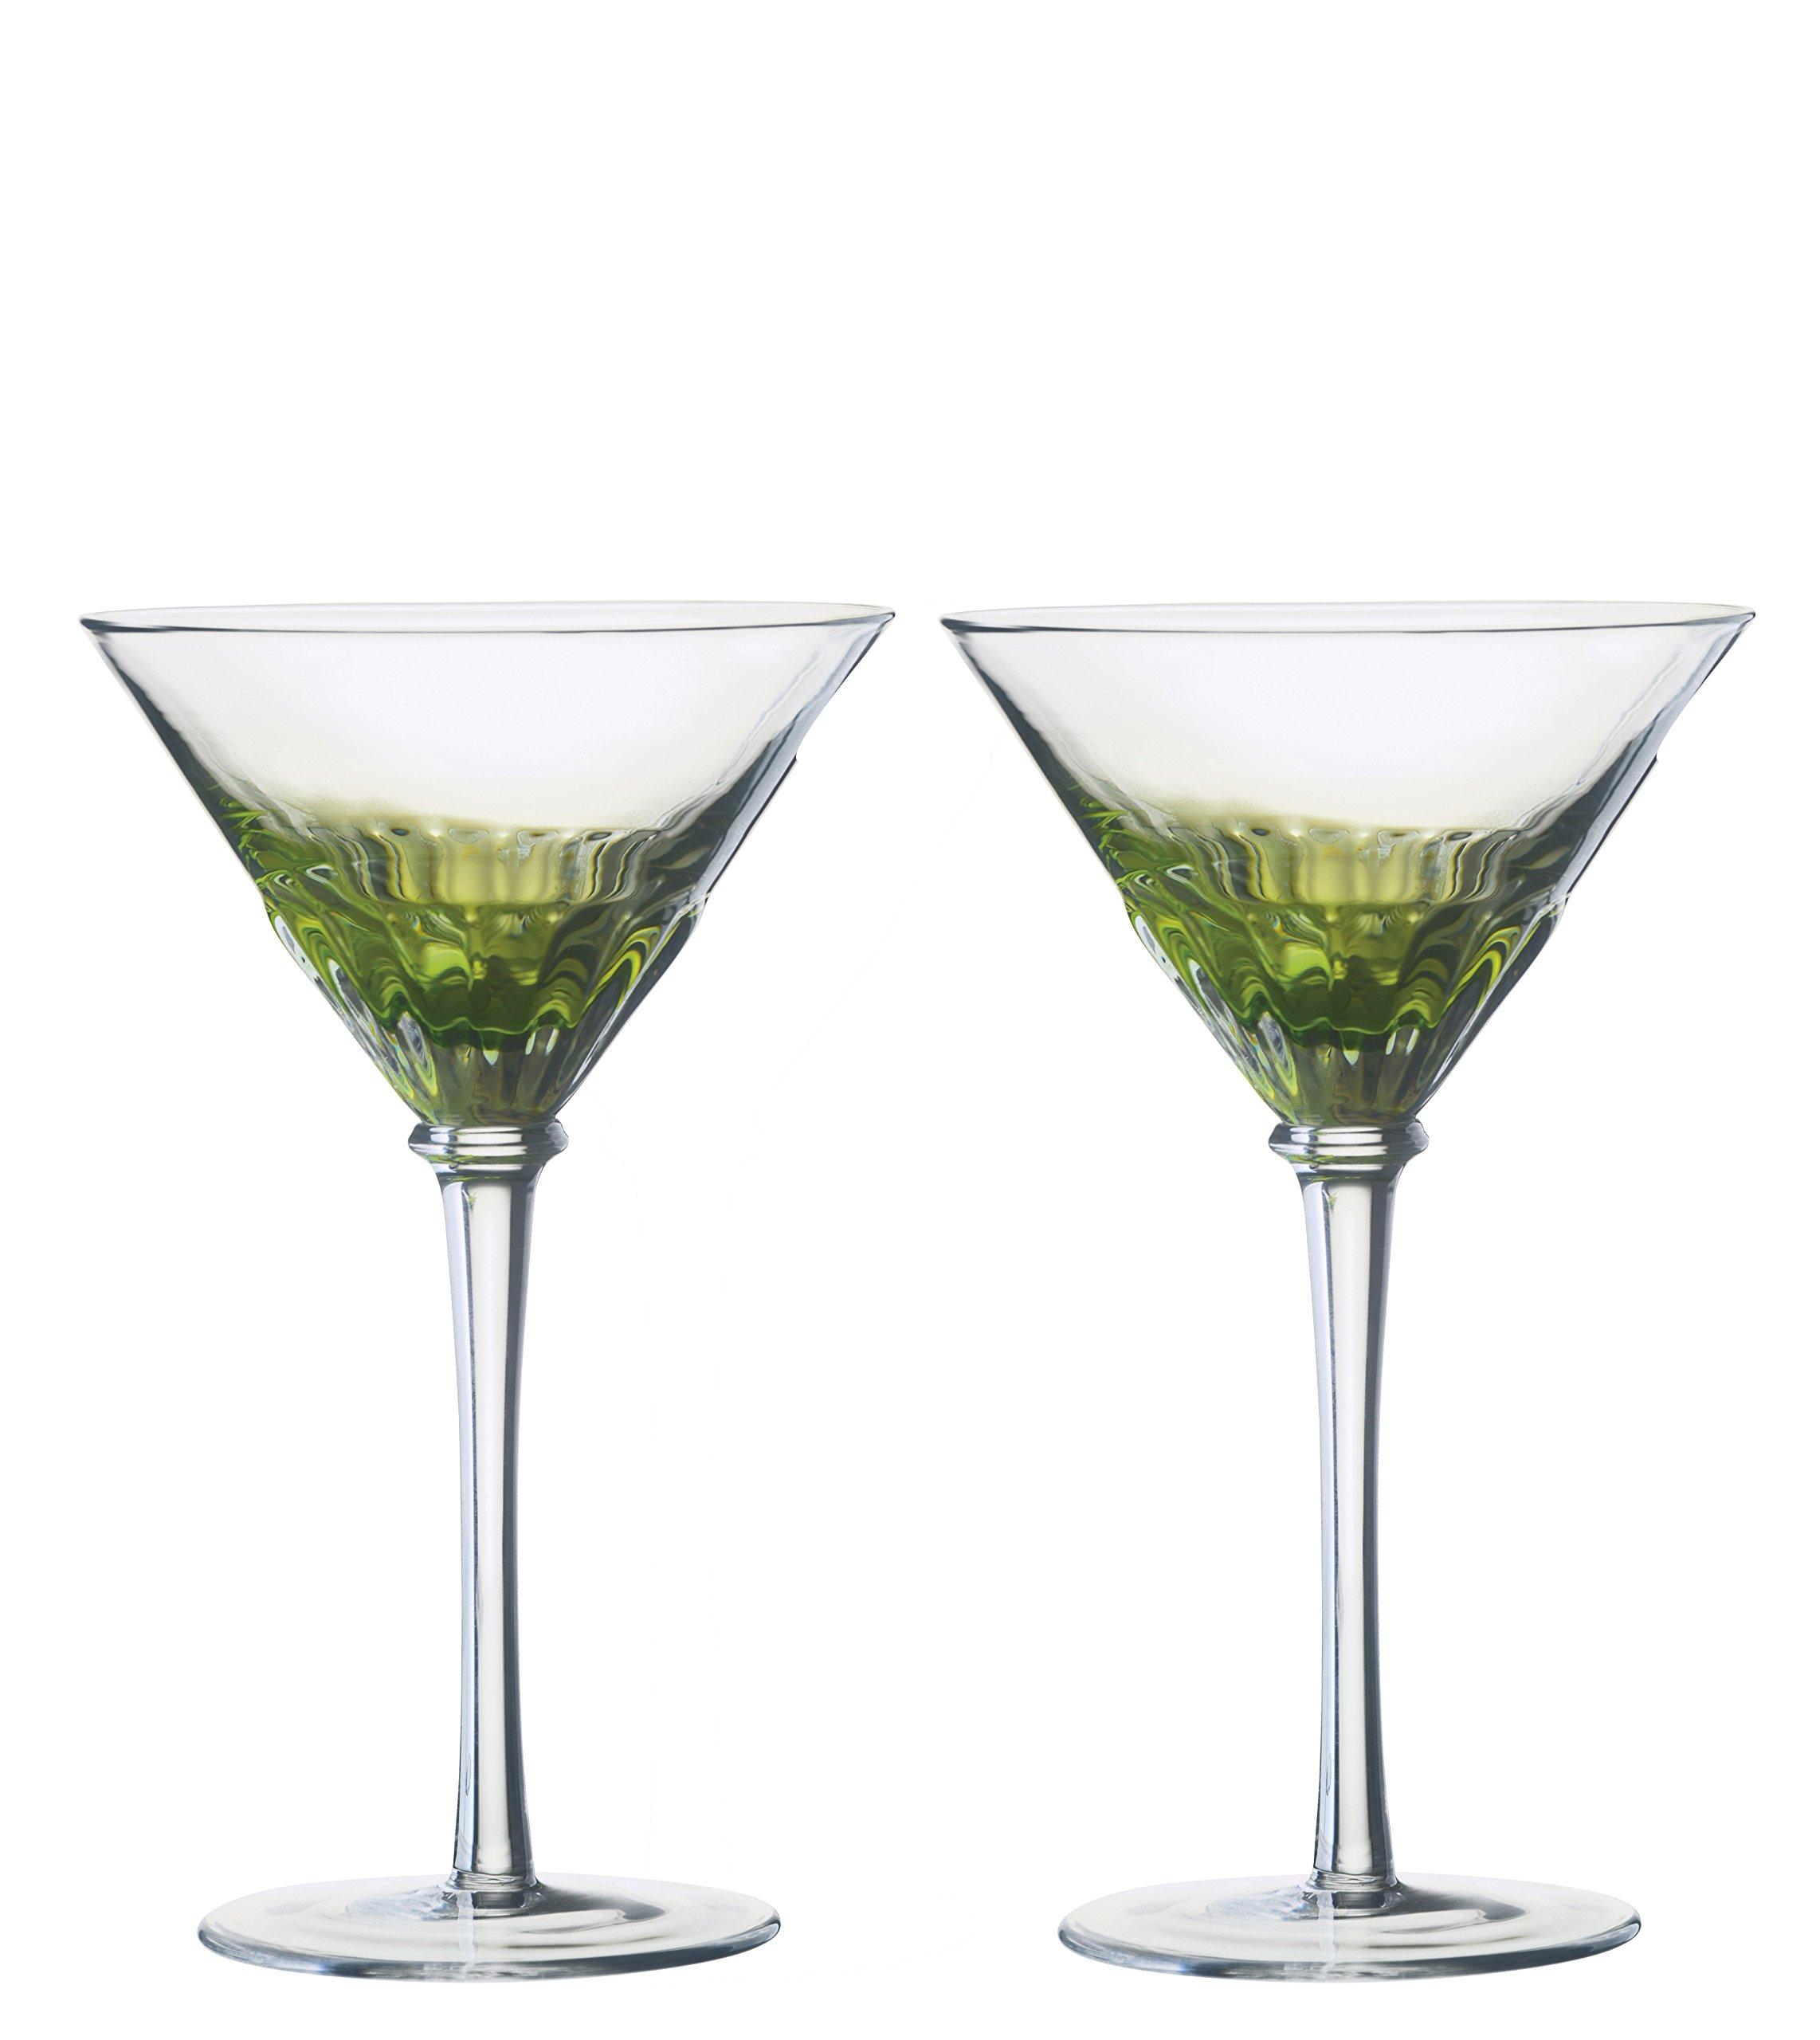 DRH Anton Studios Solar Set of 2 Martini Cocktail Glasses in Green